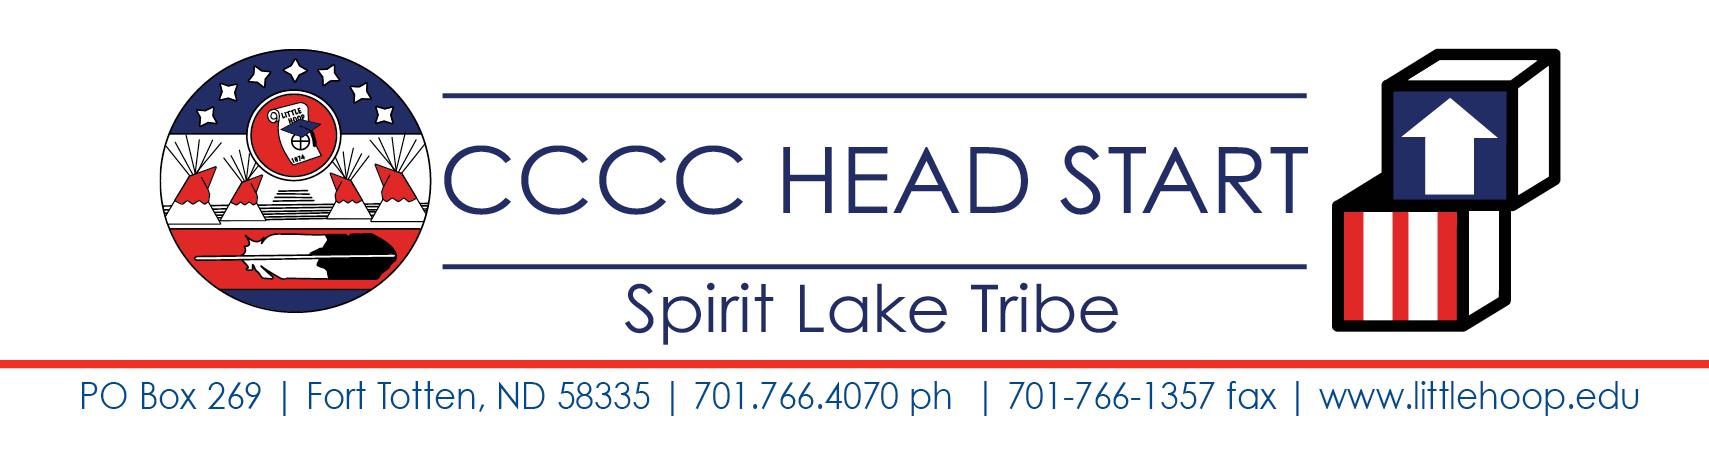 CCCC Head Start's Logo